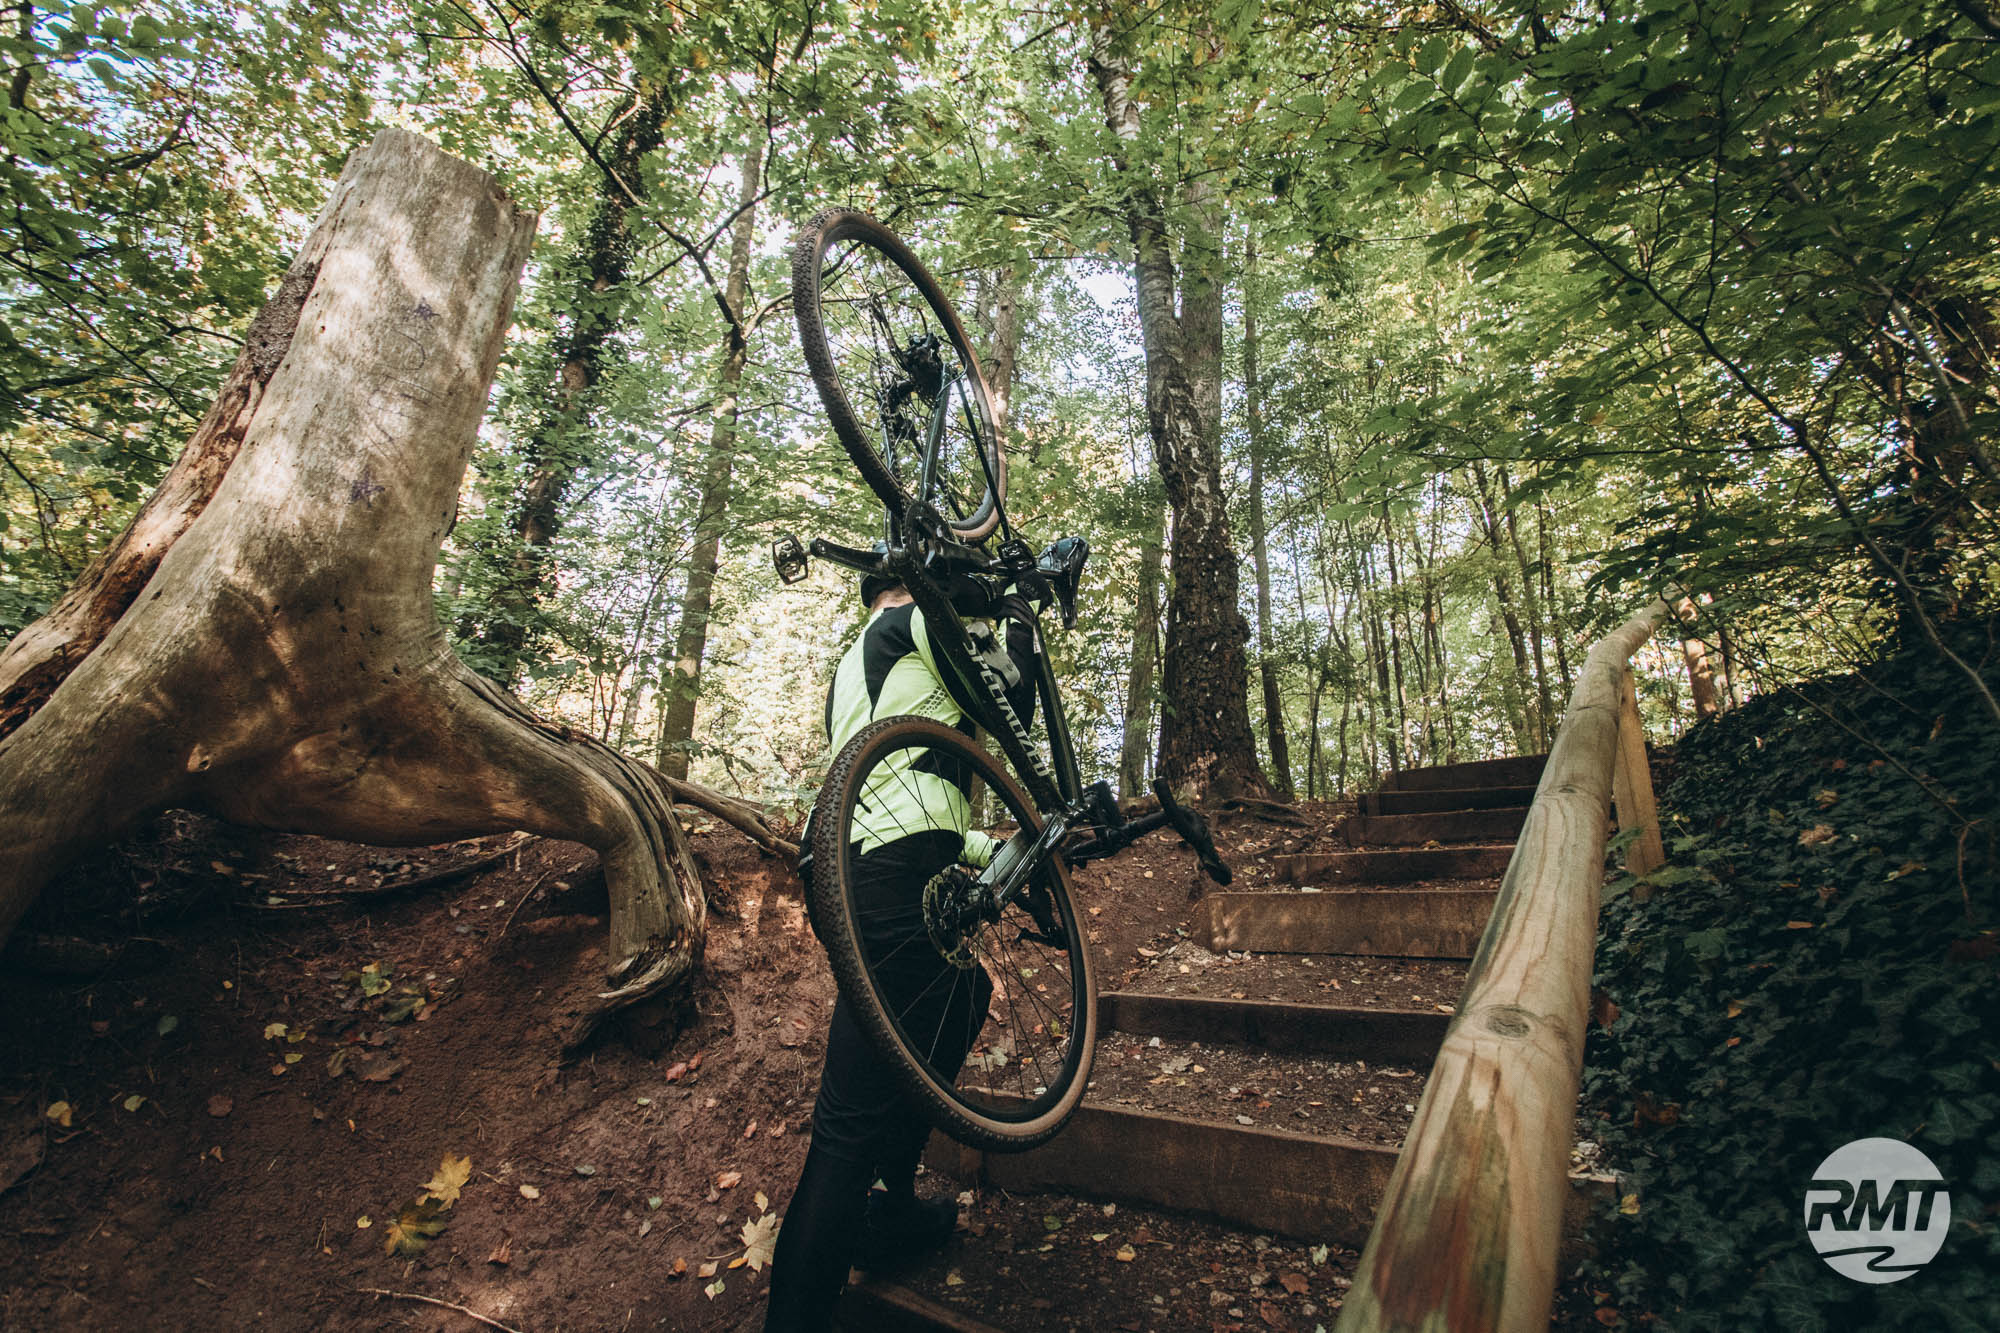 Gravel Fahrtechnik Basic Frankfurt | taunus Trails CycloCross Training Rock my Trail Bikeschule25